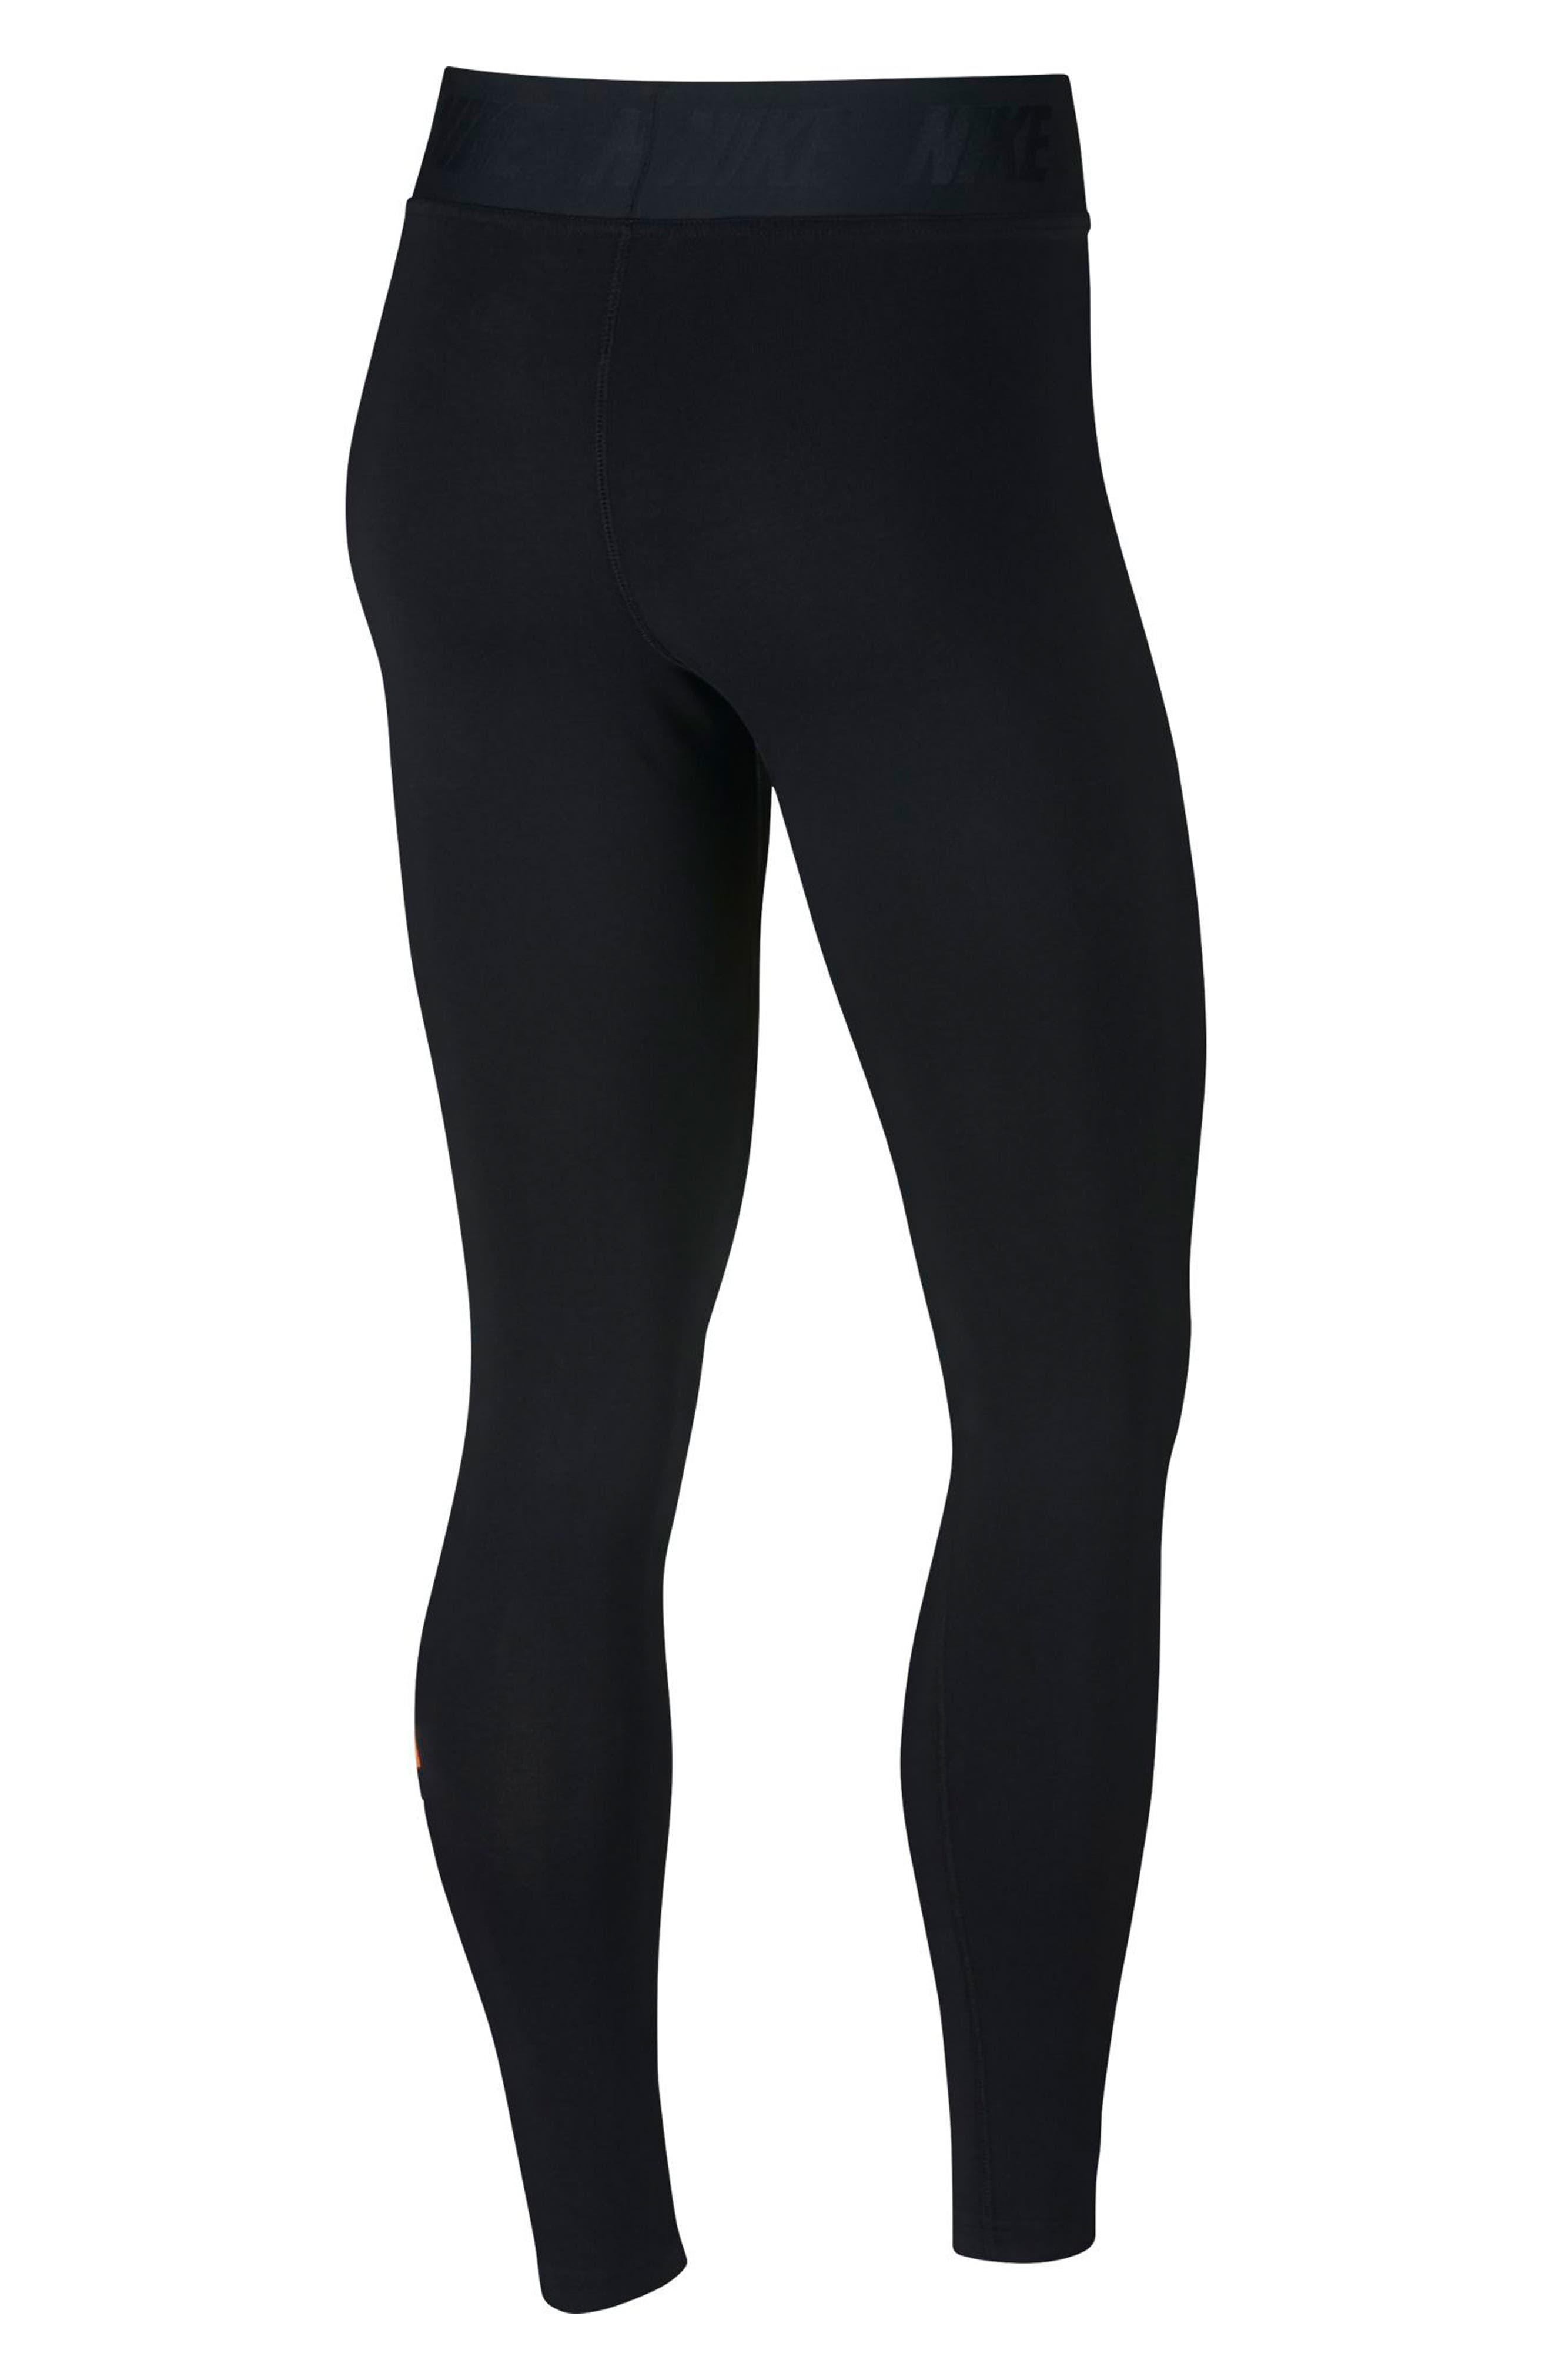 Sportswear Just Do It High Rise Women's Leggings,                             Alternate thumbnail 2, color,                             BLACK